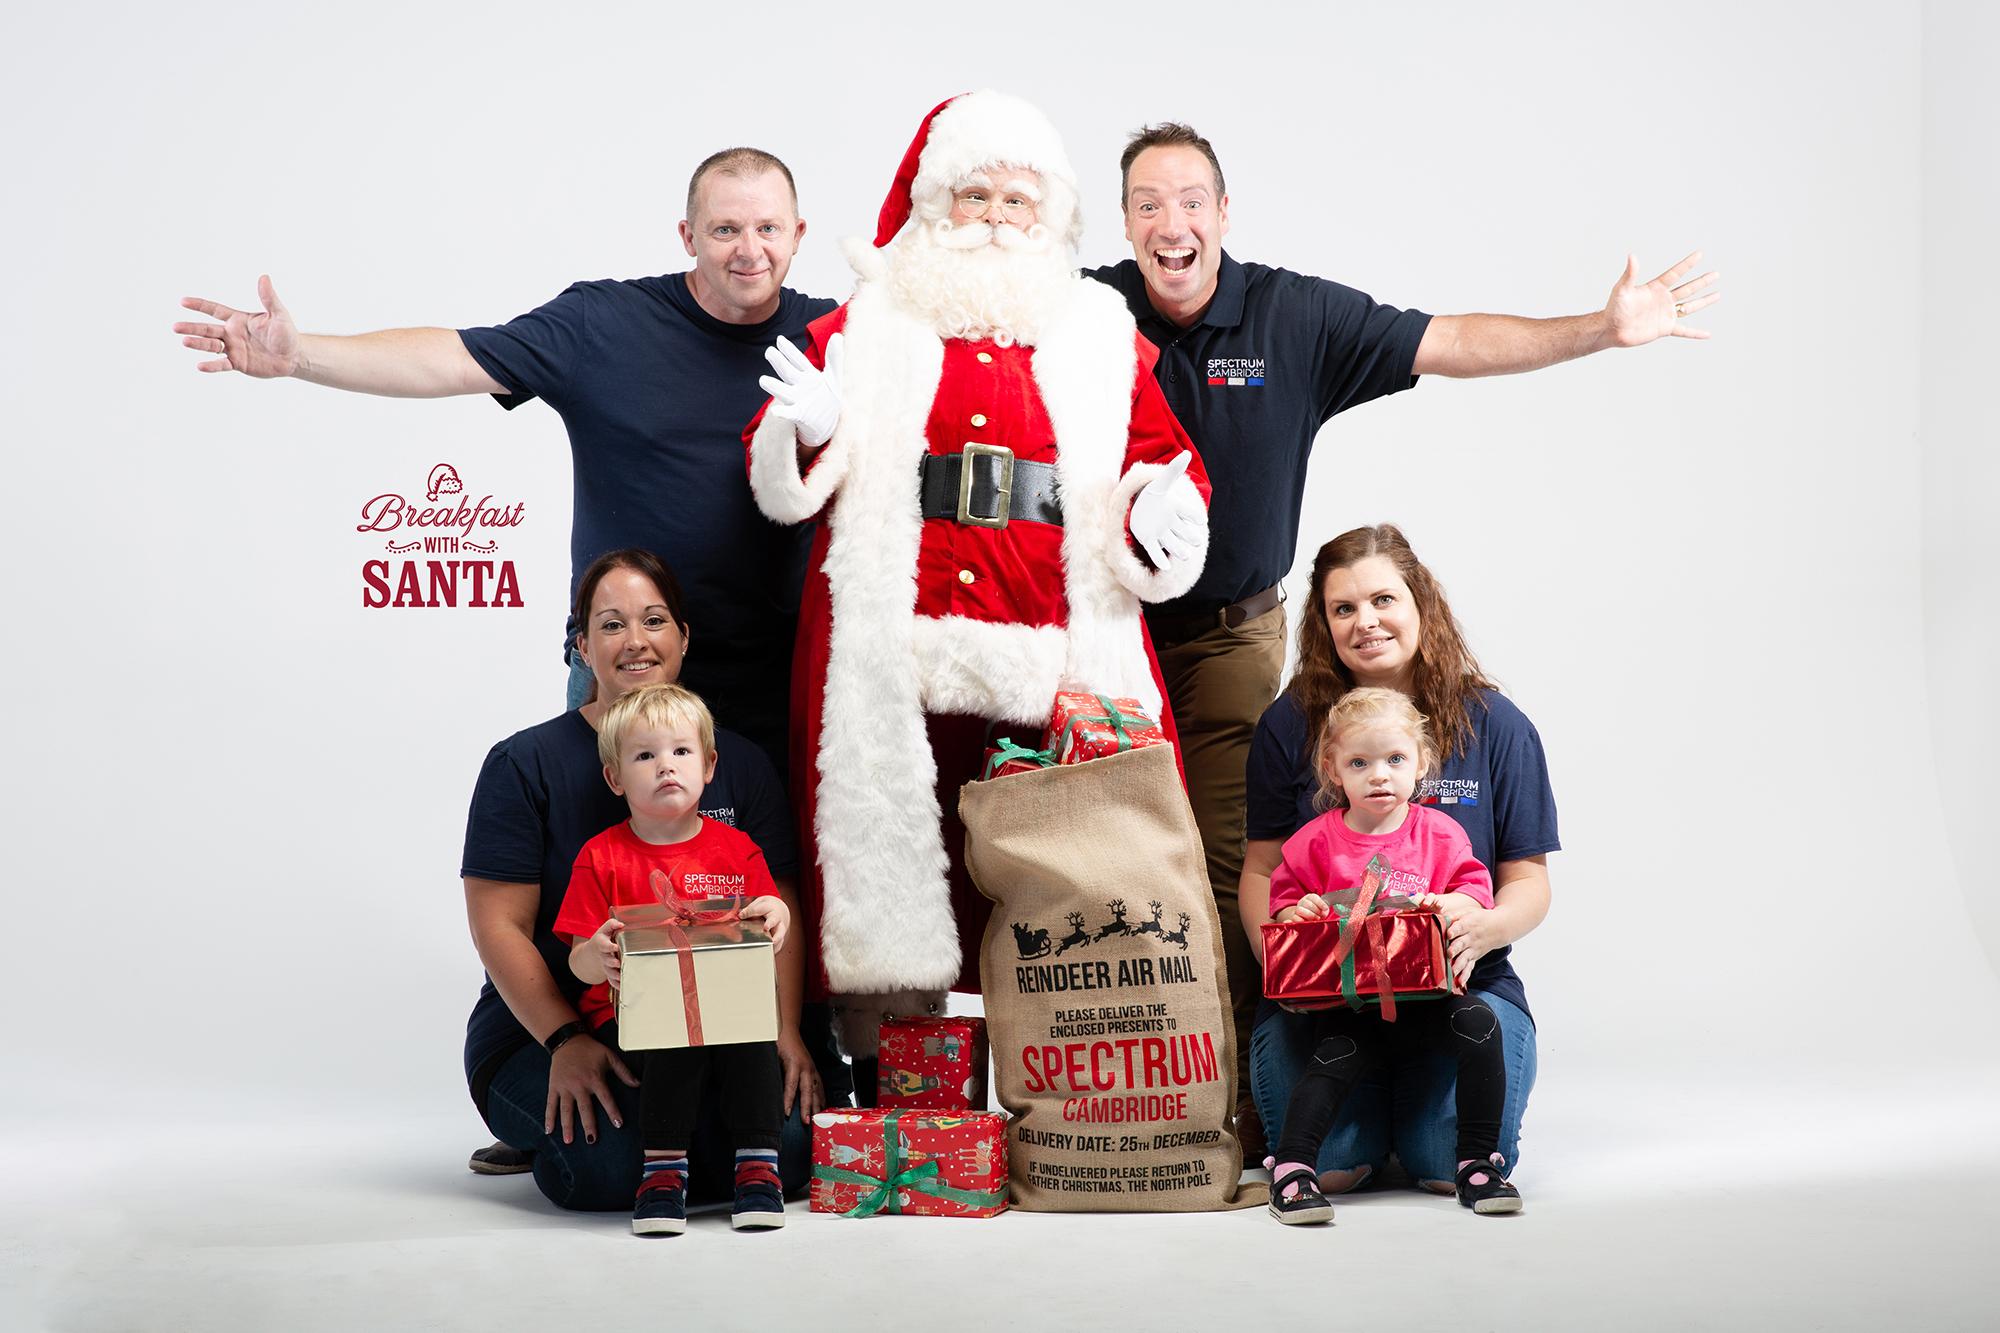 Mail On Christmas Eve 2019.Breakfast With Santa Spectrum Cambridge